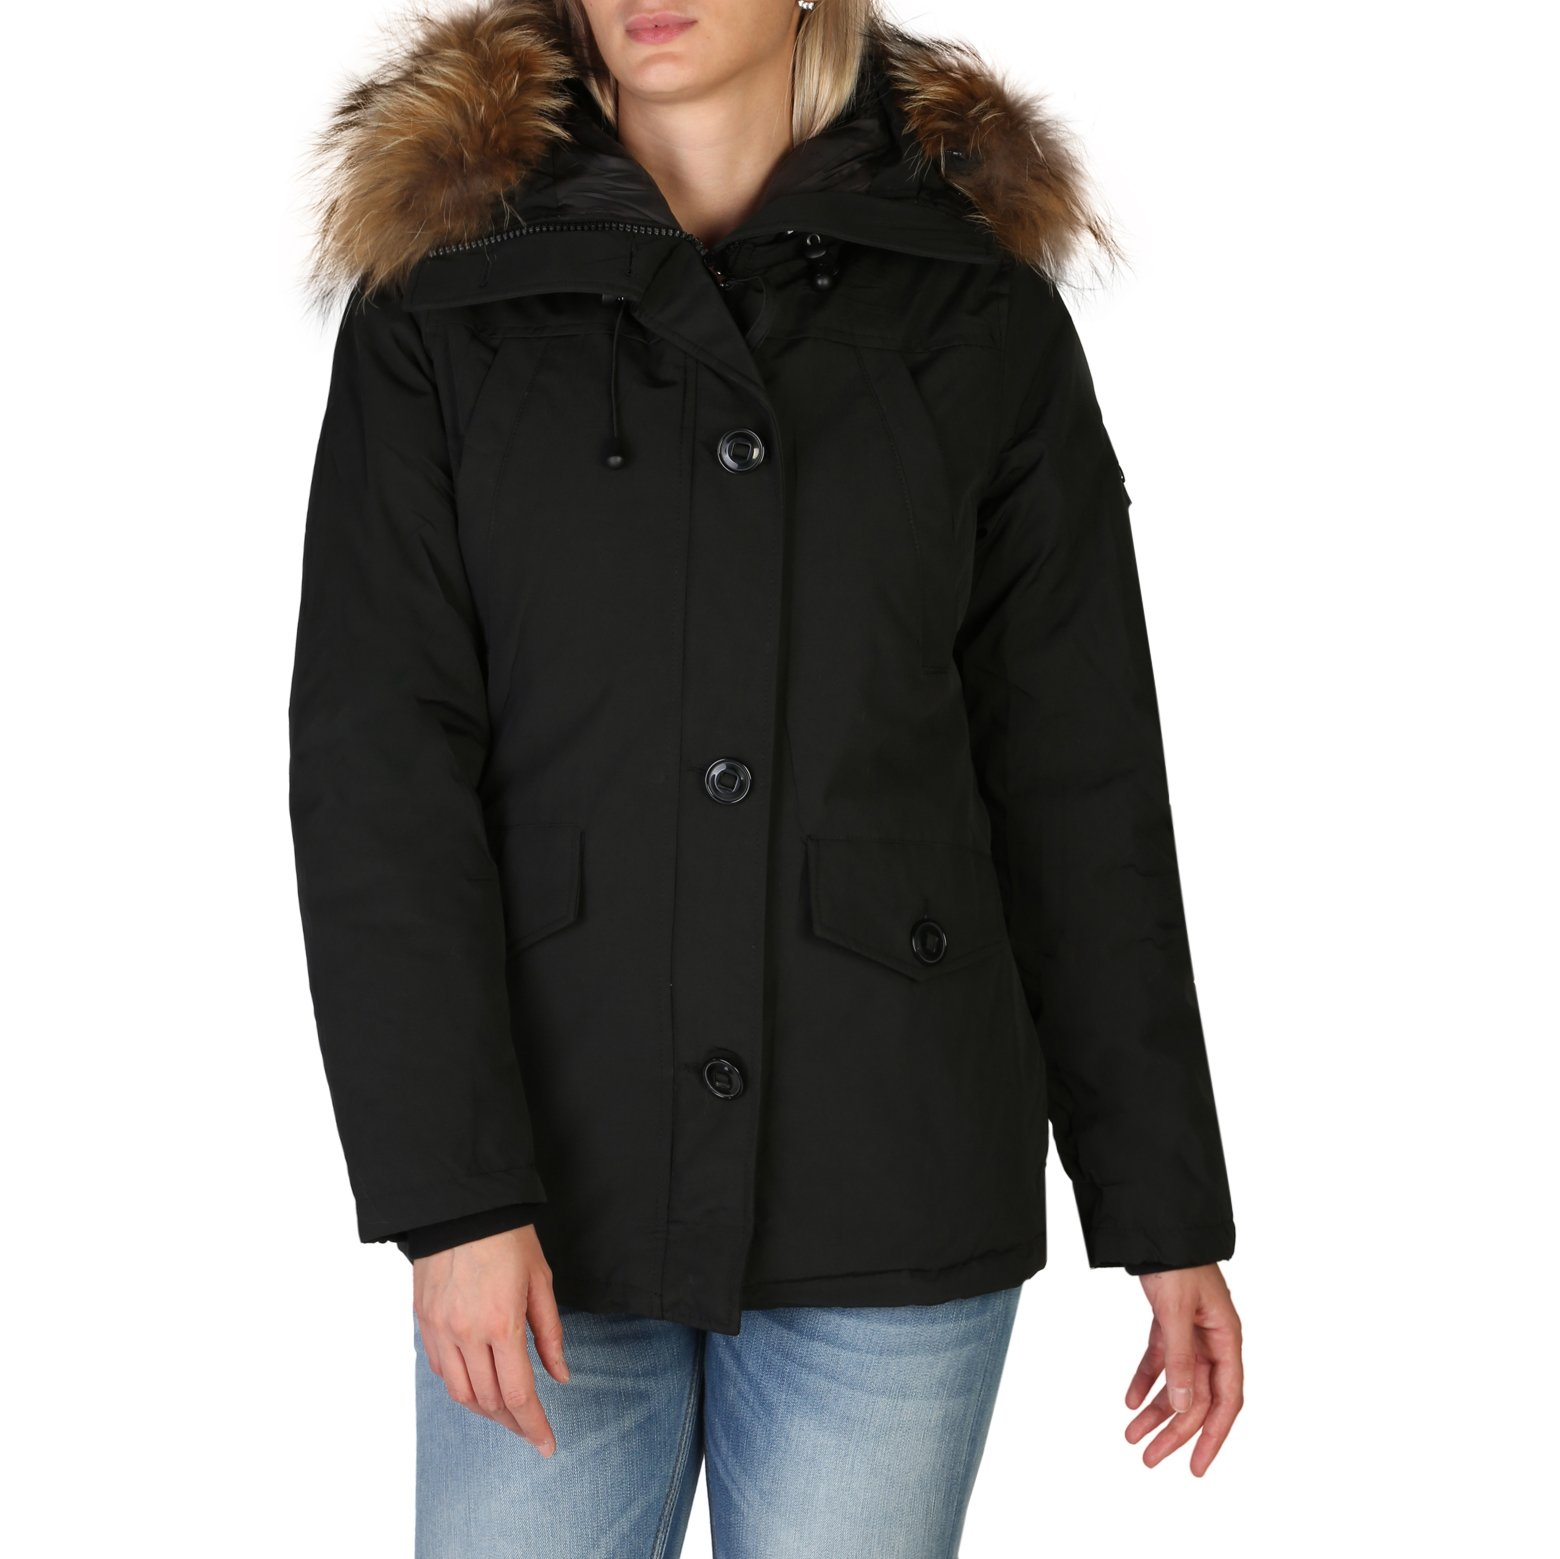 Alessandro Dell'Acqua Women's Jacket Various Colours 348359 - black XL